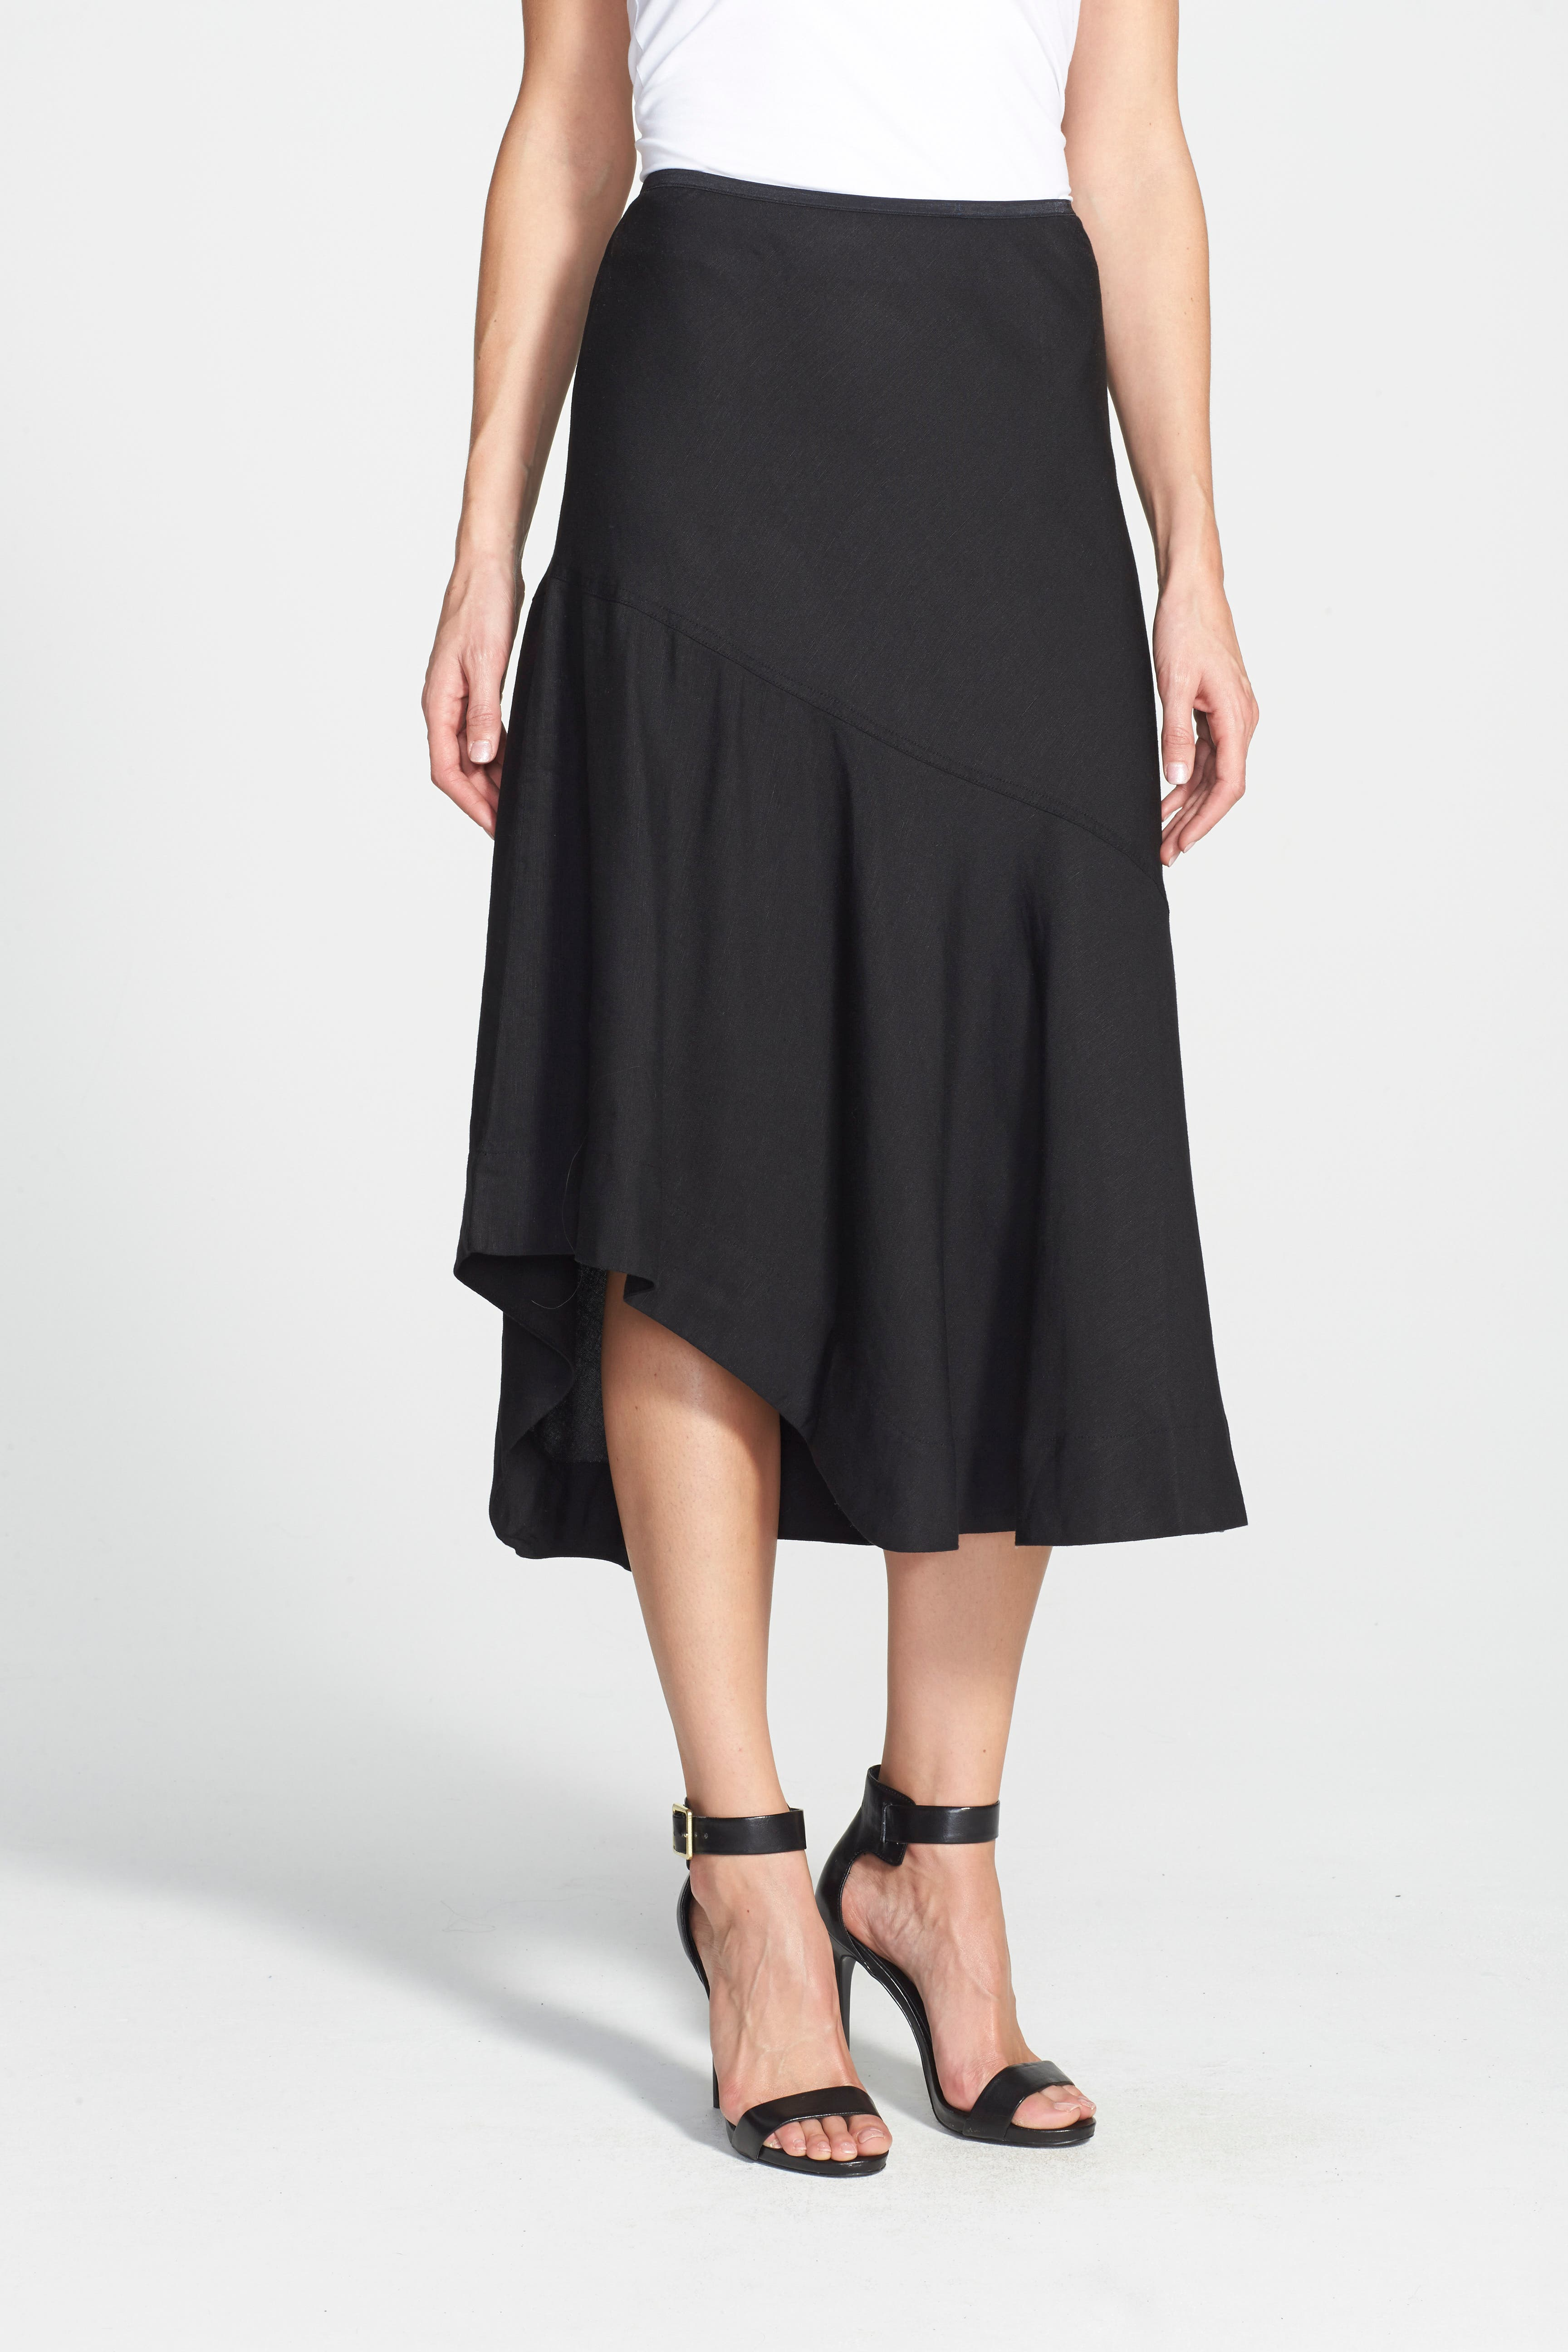 NIC+ZOE,                             'The Long Engagement' Midi Skirt,                             Alternate thumbnail 5, color,                             004